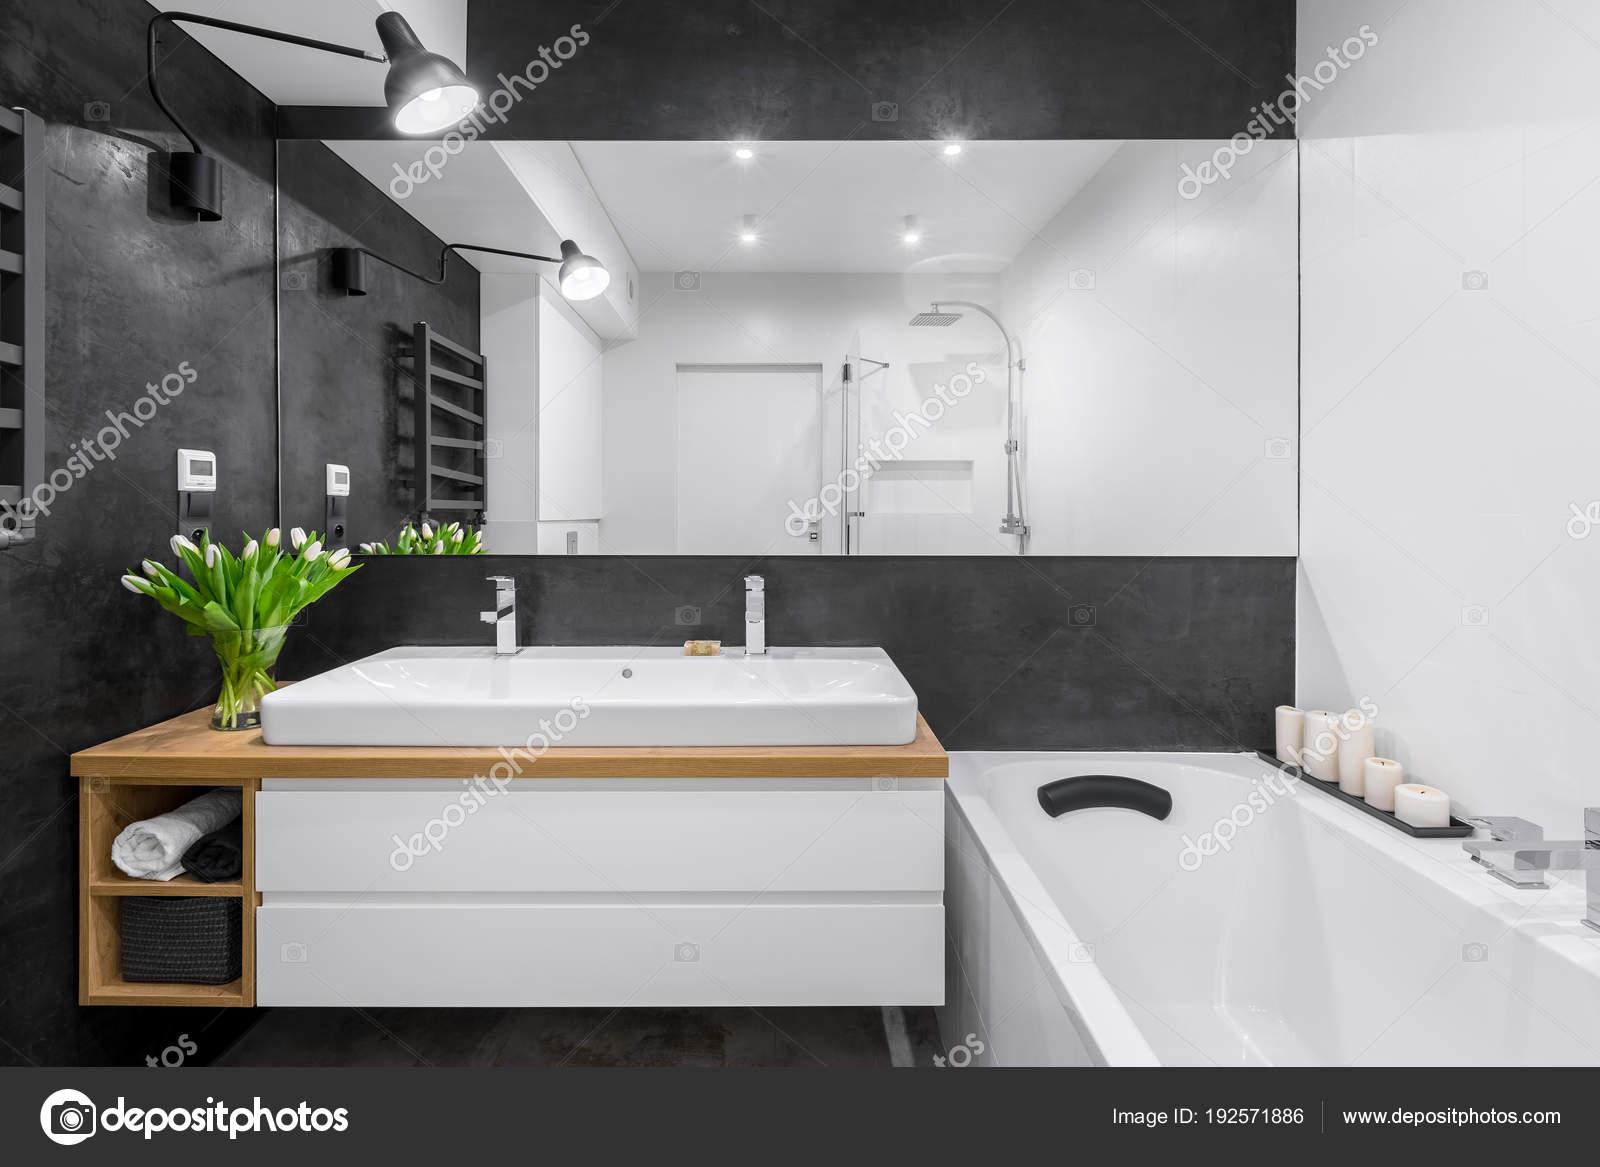 Spiegel Voor Badkamer : Badkamer met grote spiegel u2014 stockfoto © in4mal #192571886